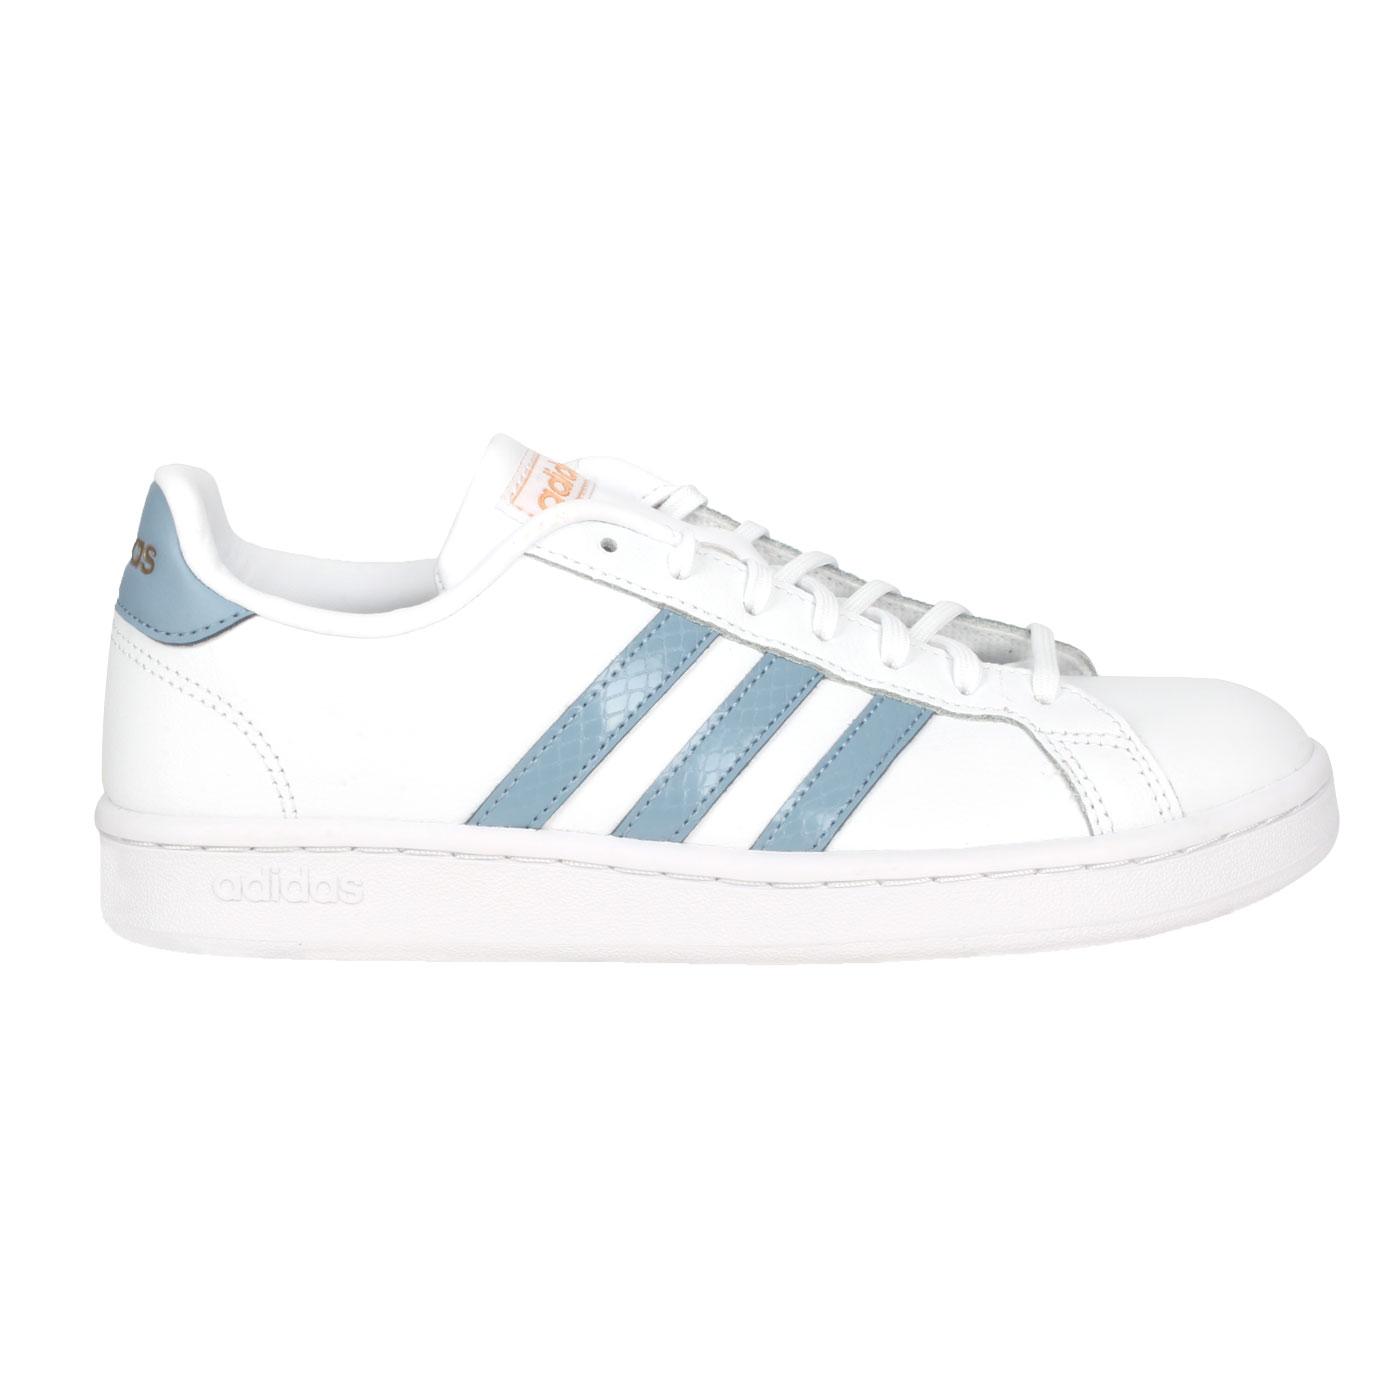 ADIDAS 女款運動休閒鞋  @GRAND COURT@FW2686 - 白粉藍